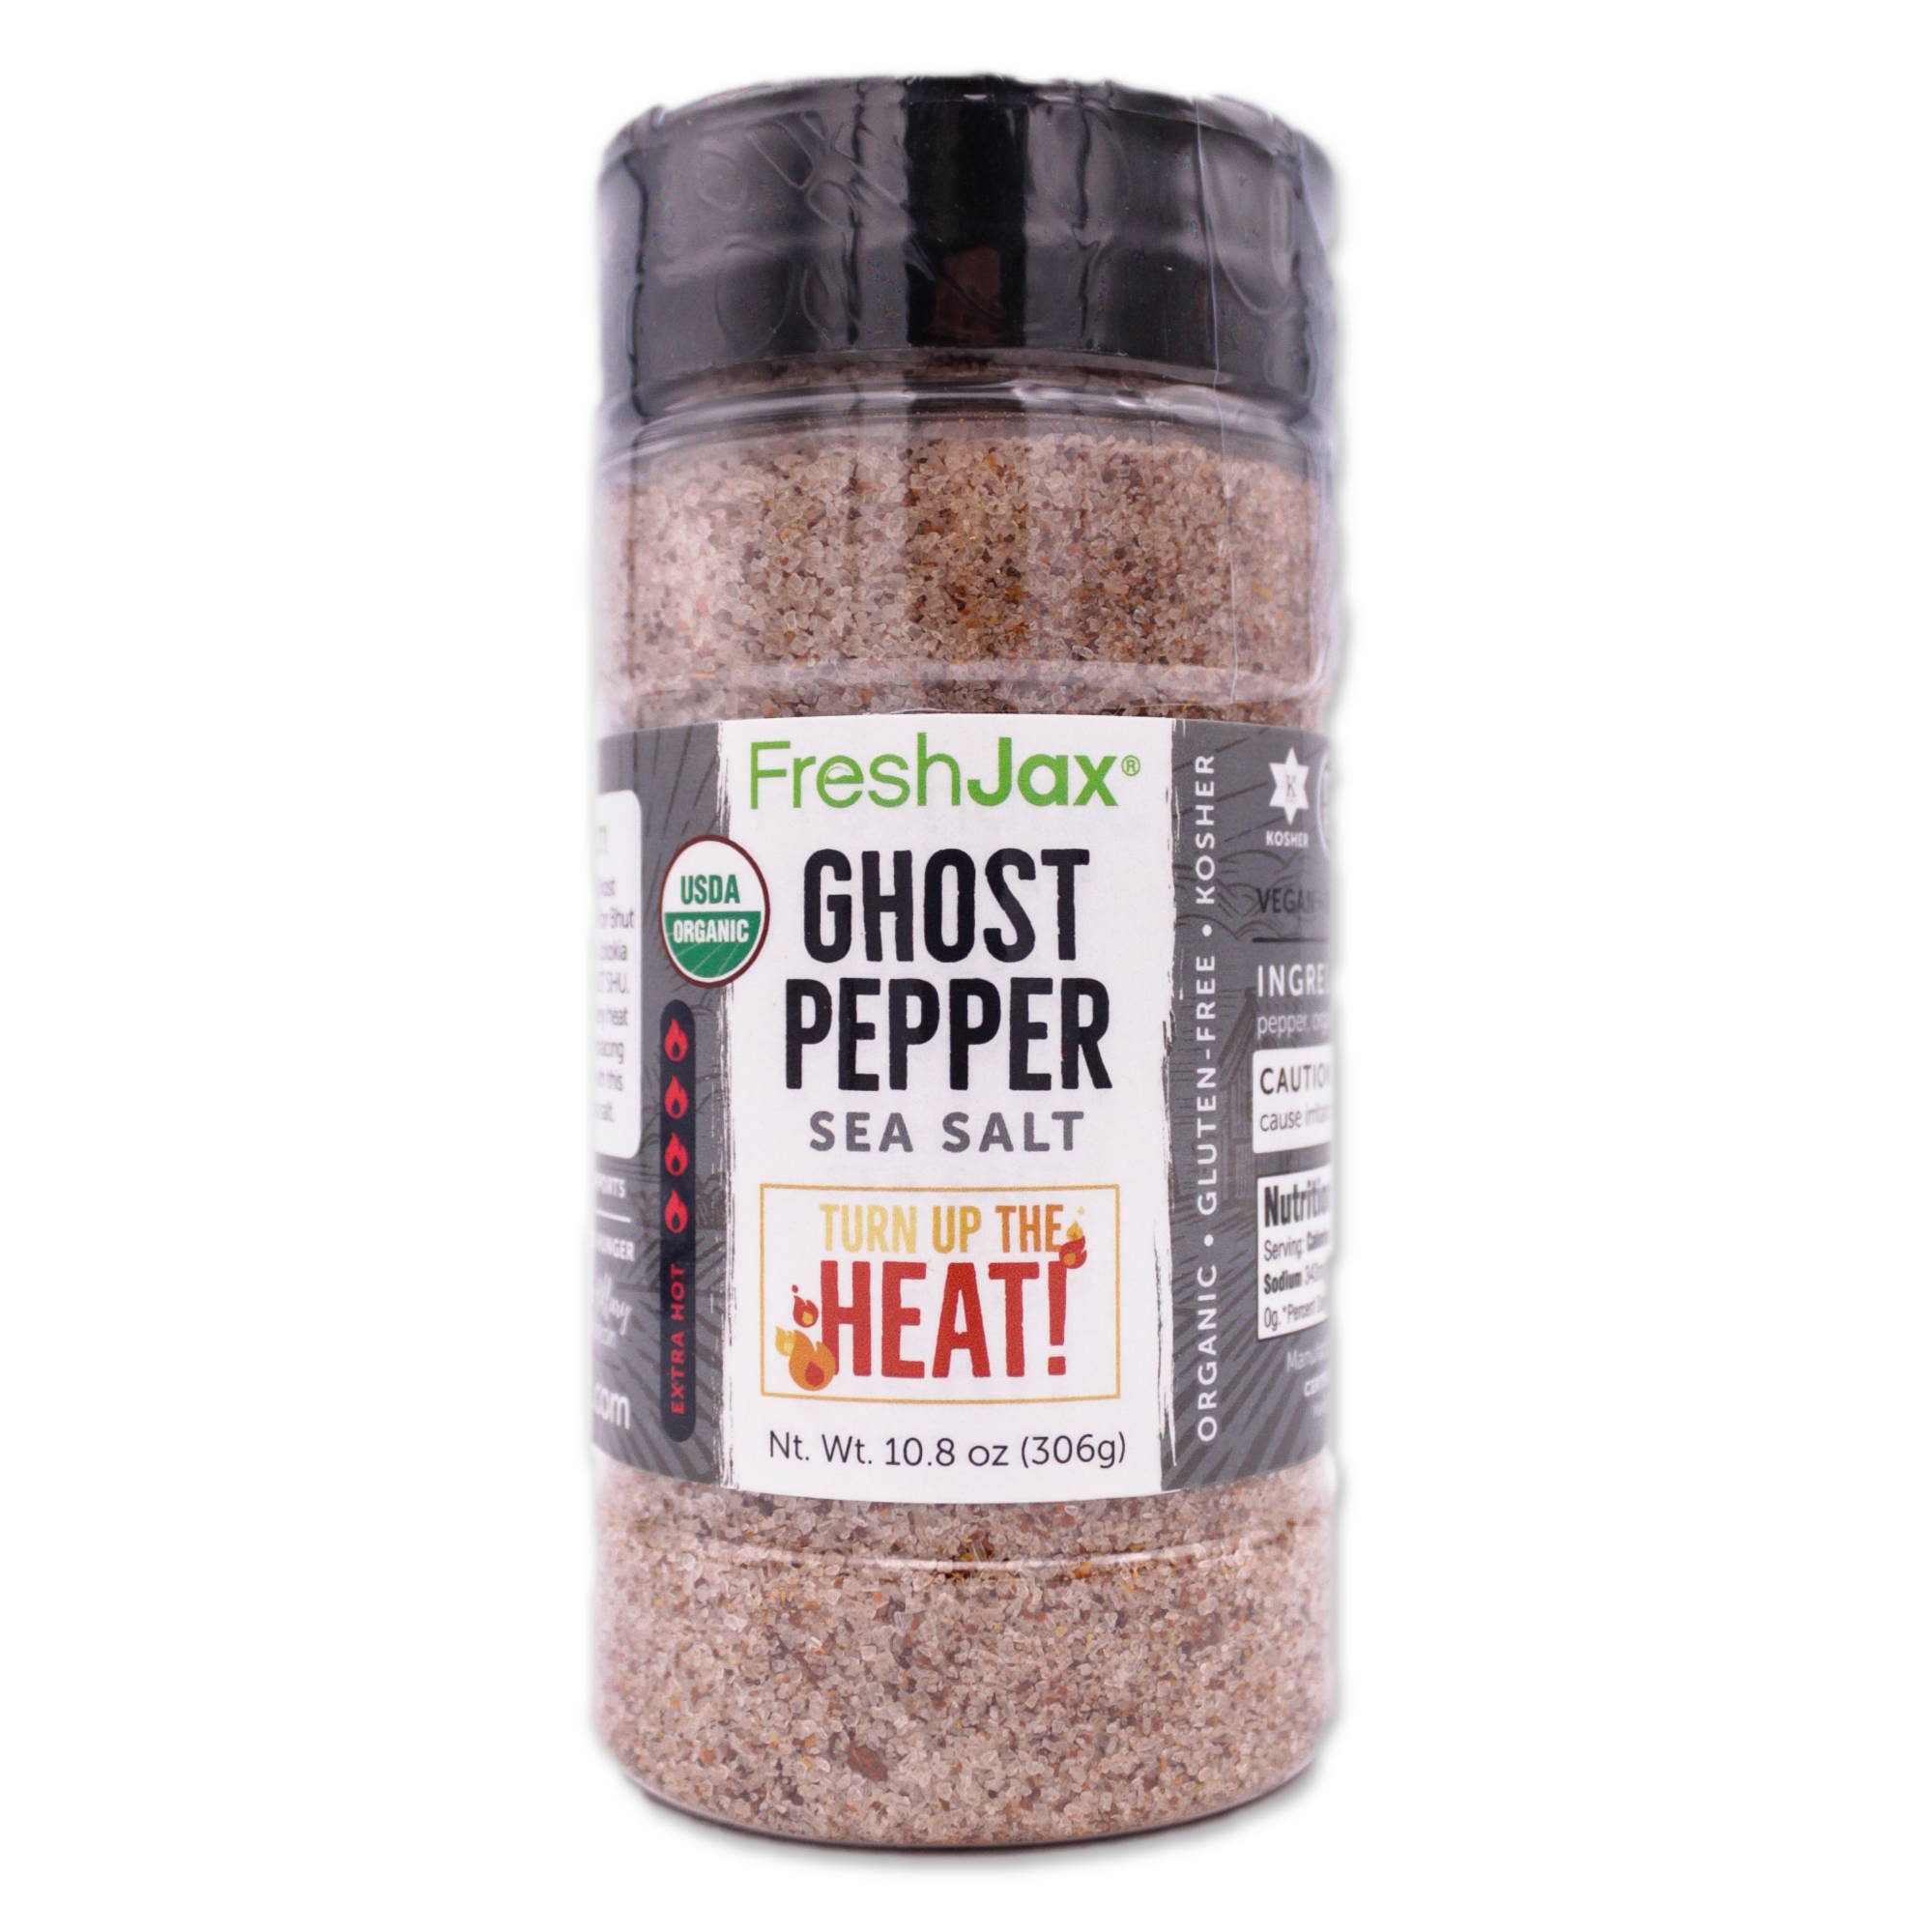 Ghost Pepper Sea Salt FreshJax Organic Spices